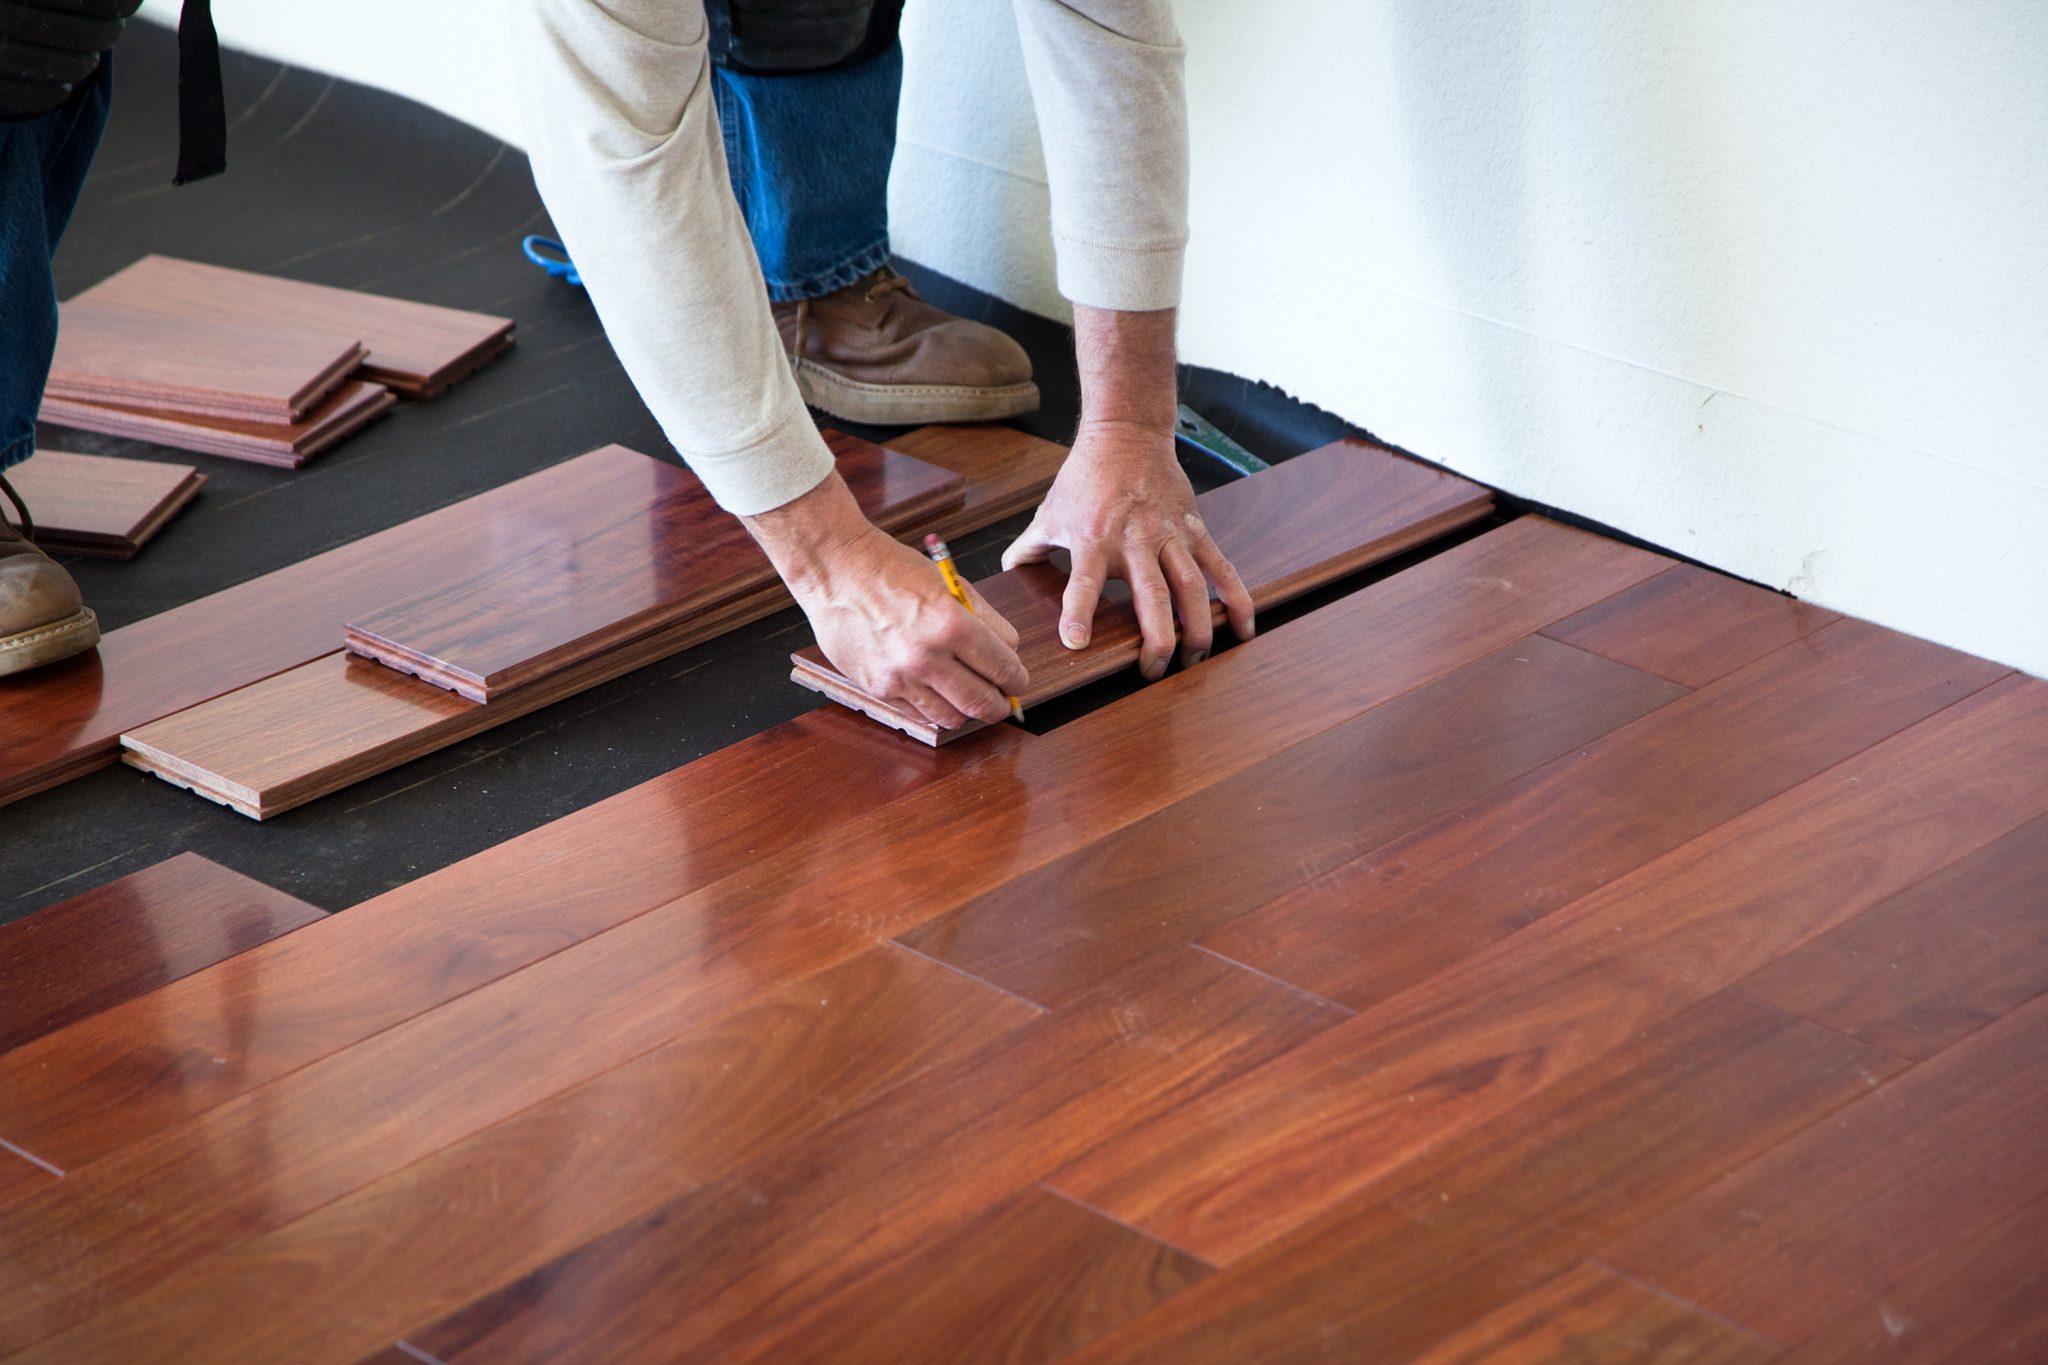 Secrets to Clean Hardwood Floors is Revealed!